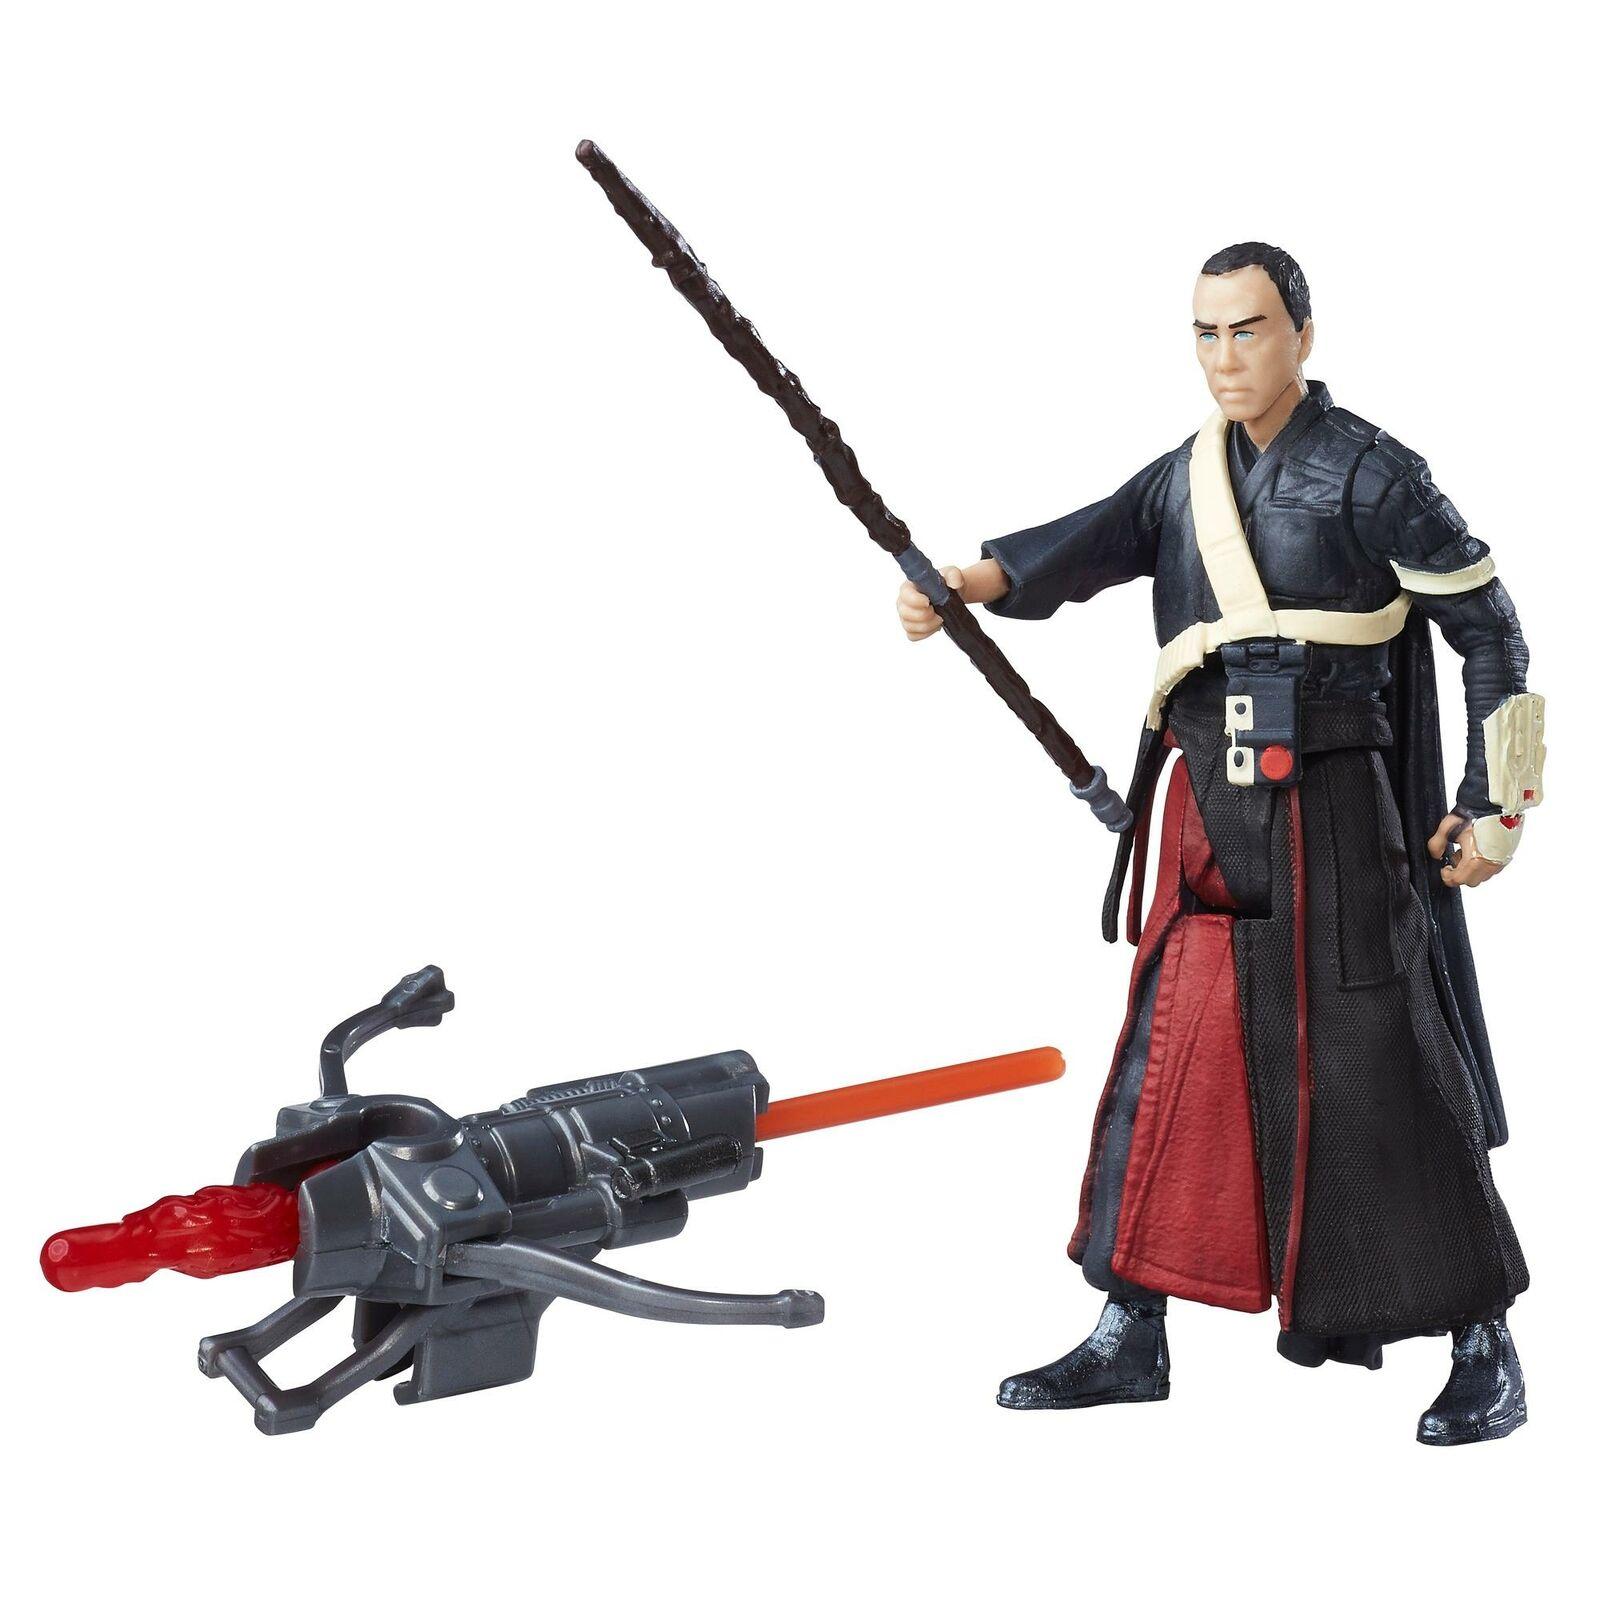 "Disney Star Wars 3.75"" Figures: Rey $3.20, Kylo Ren or Jyn Erso $3, Chirrut Imwe"